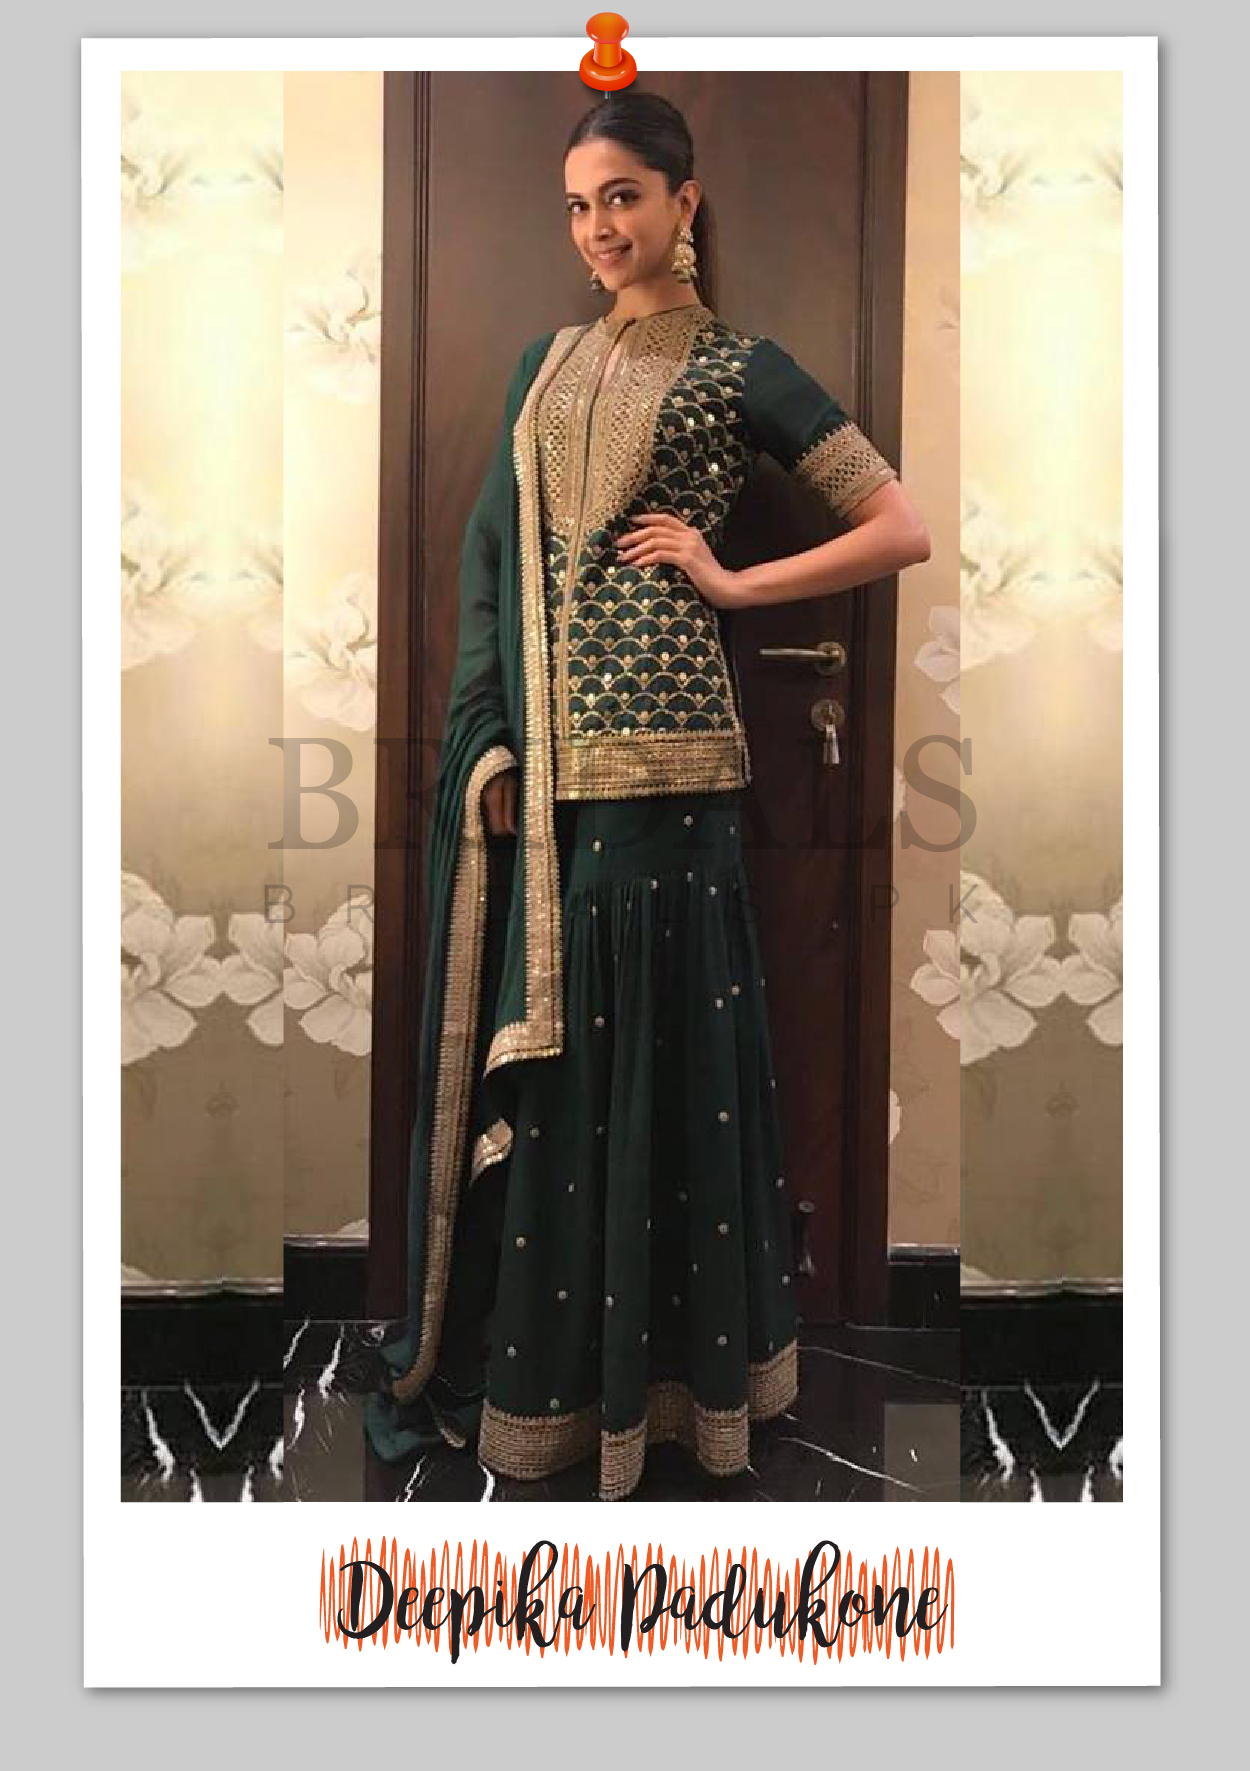 Deepika Padukone Wears Sabyasachi